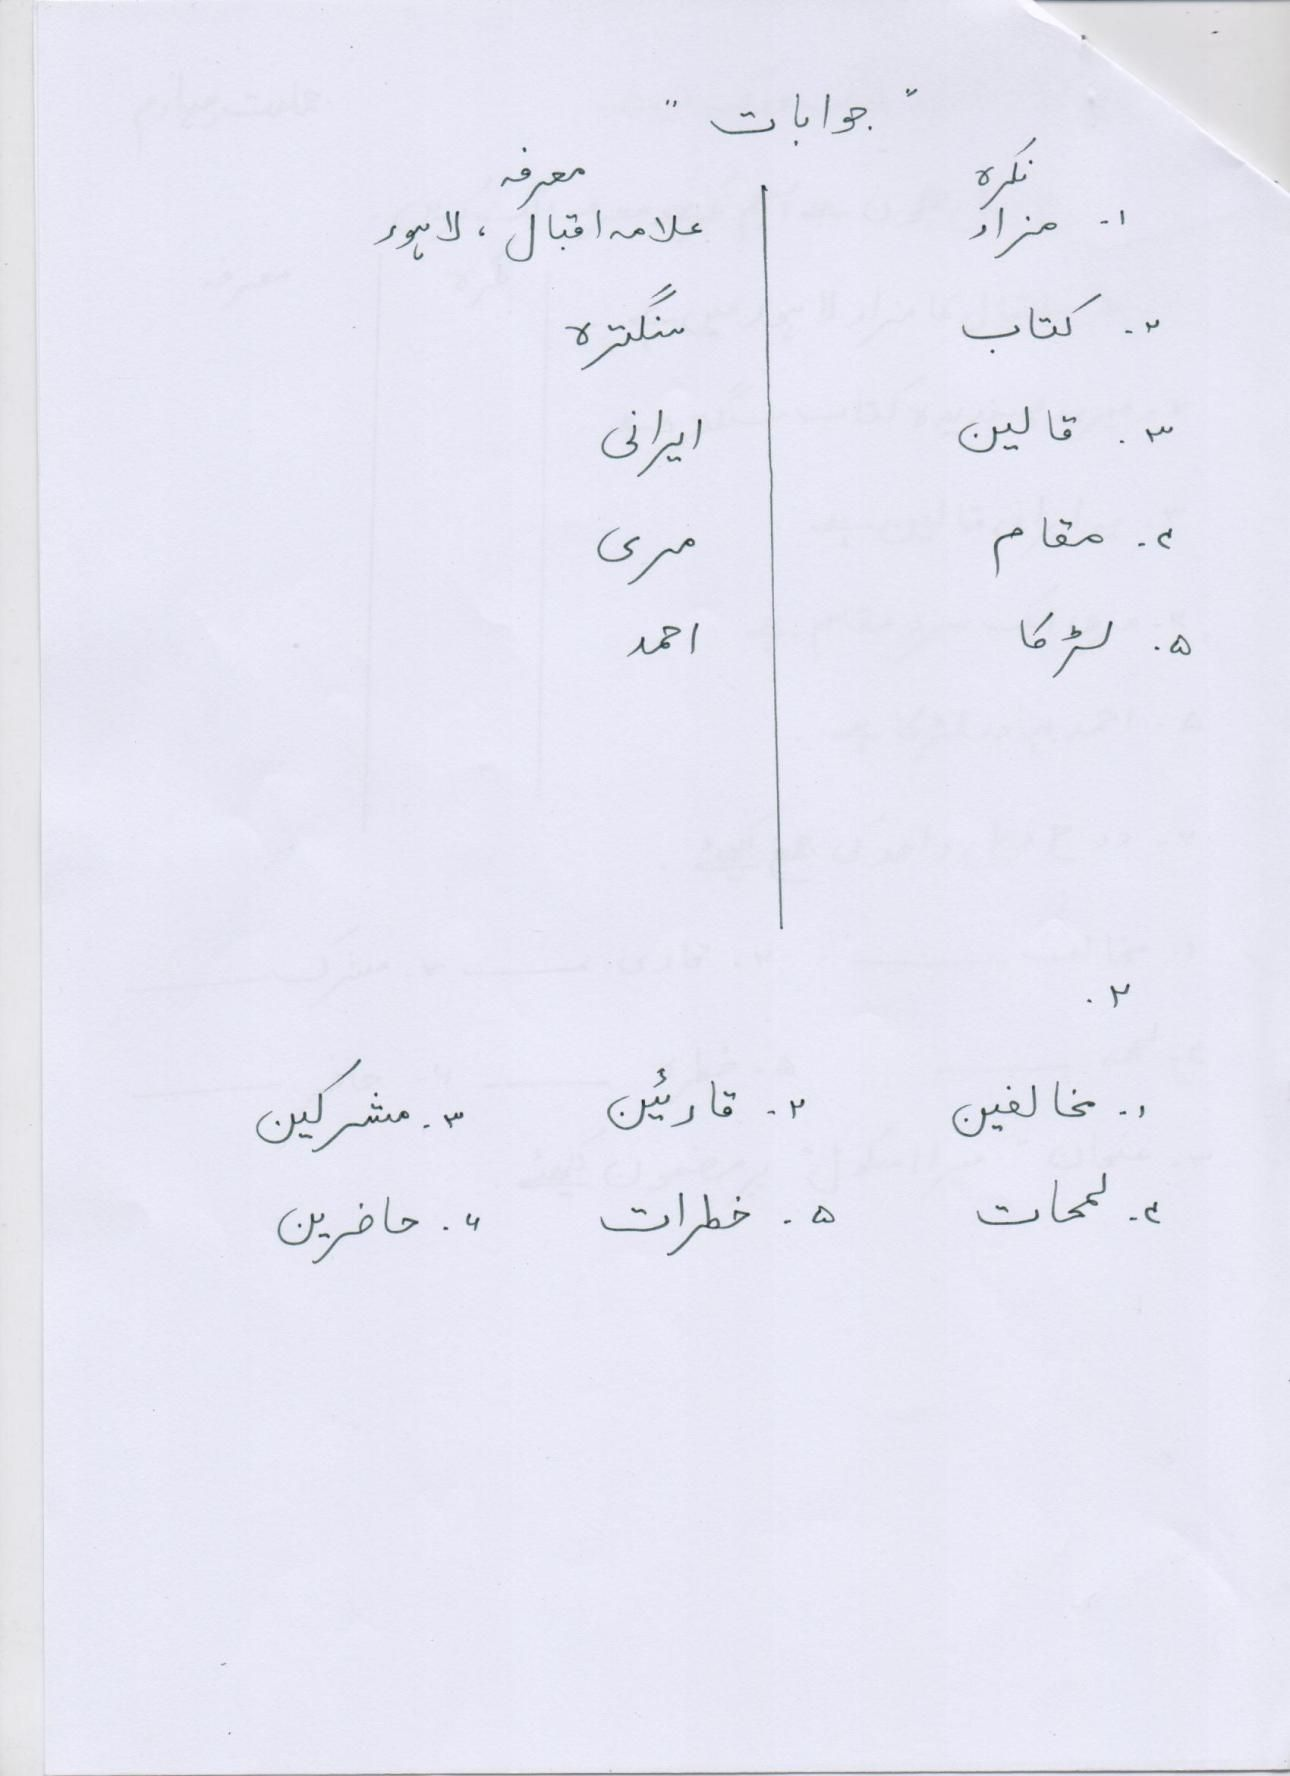 Urdu Worksheet For Class 4 Karachi   Printable Worksheets and Activities  for Teachers [ 1776 x 1290 Pixel ]